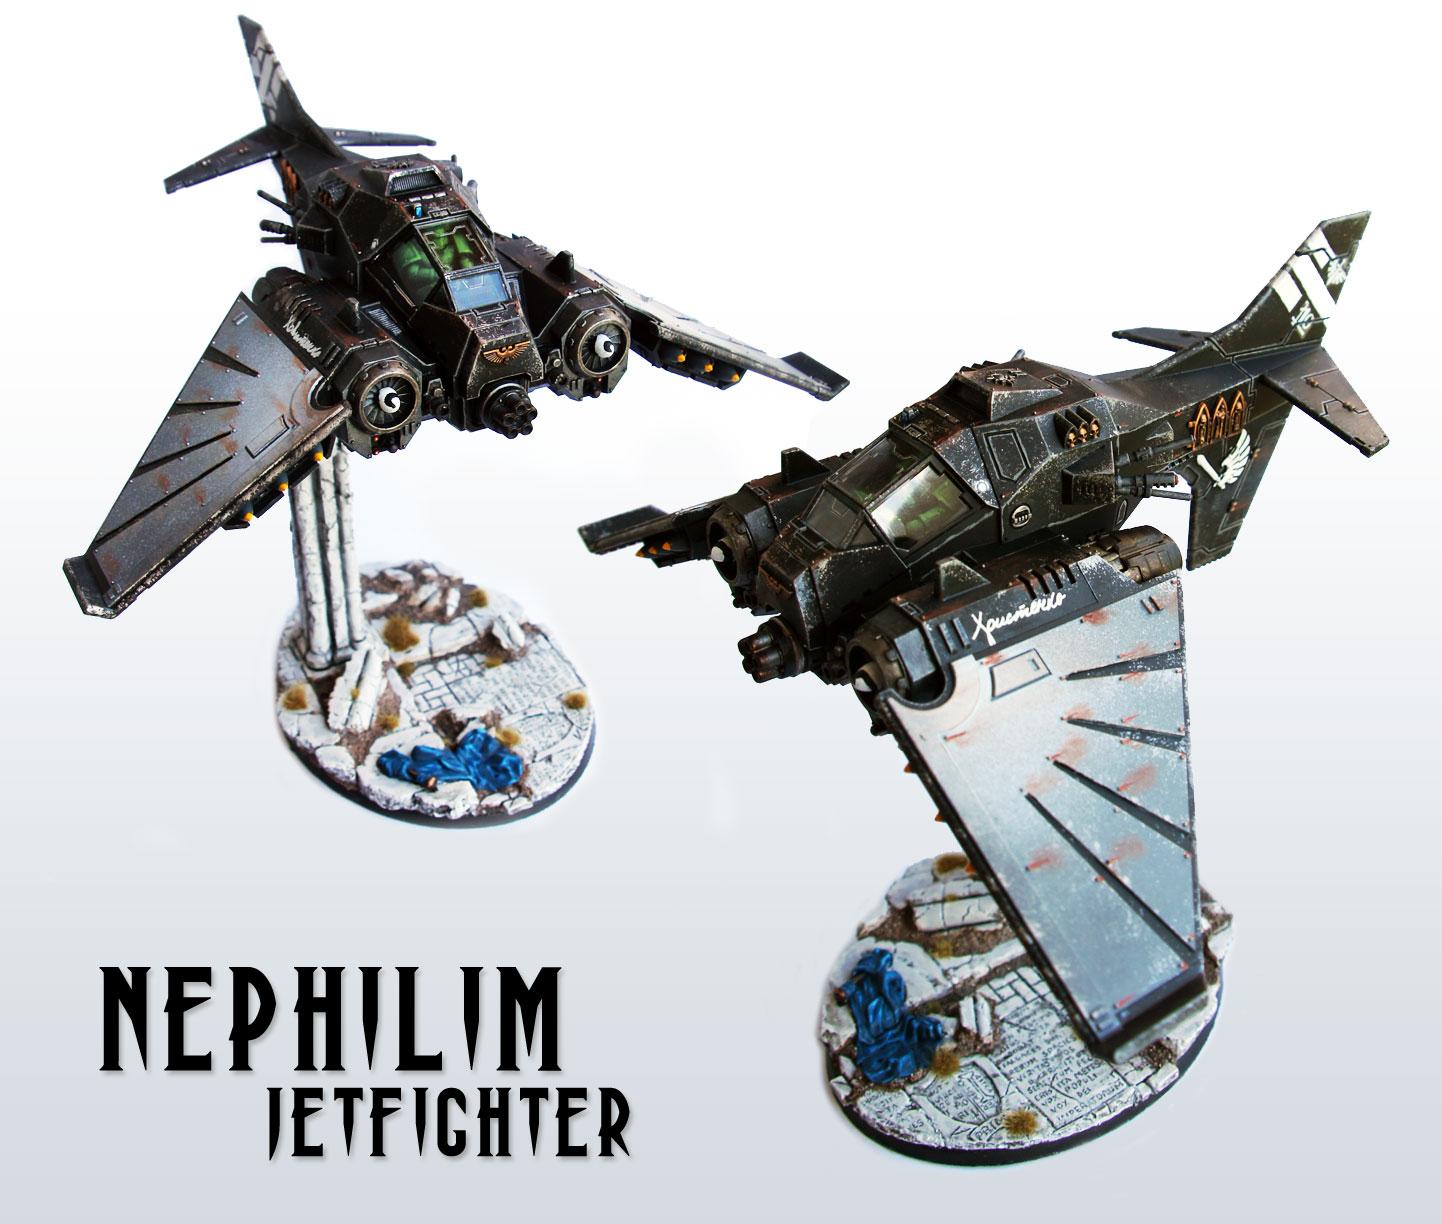 Dark Angels Nephilim Jetfighter